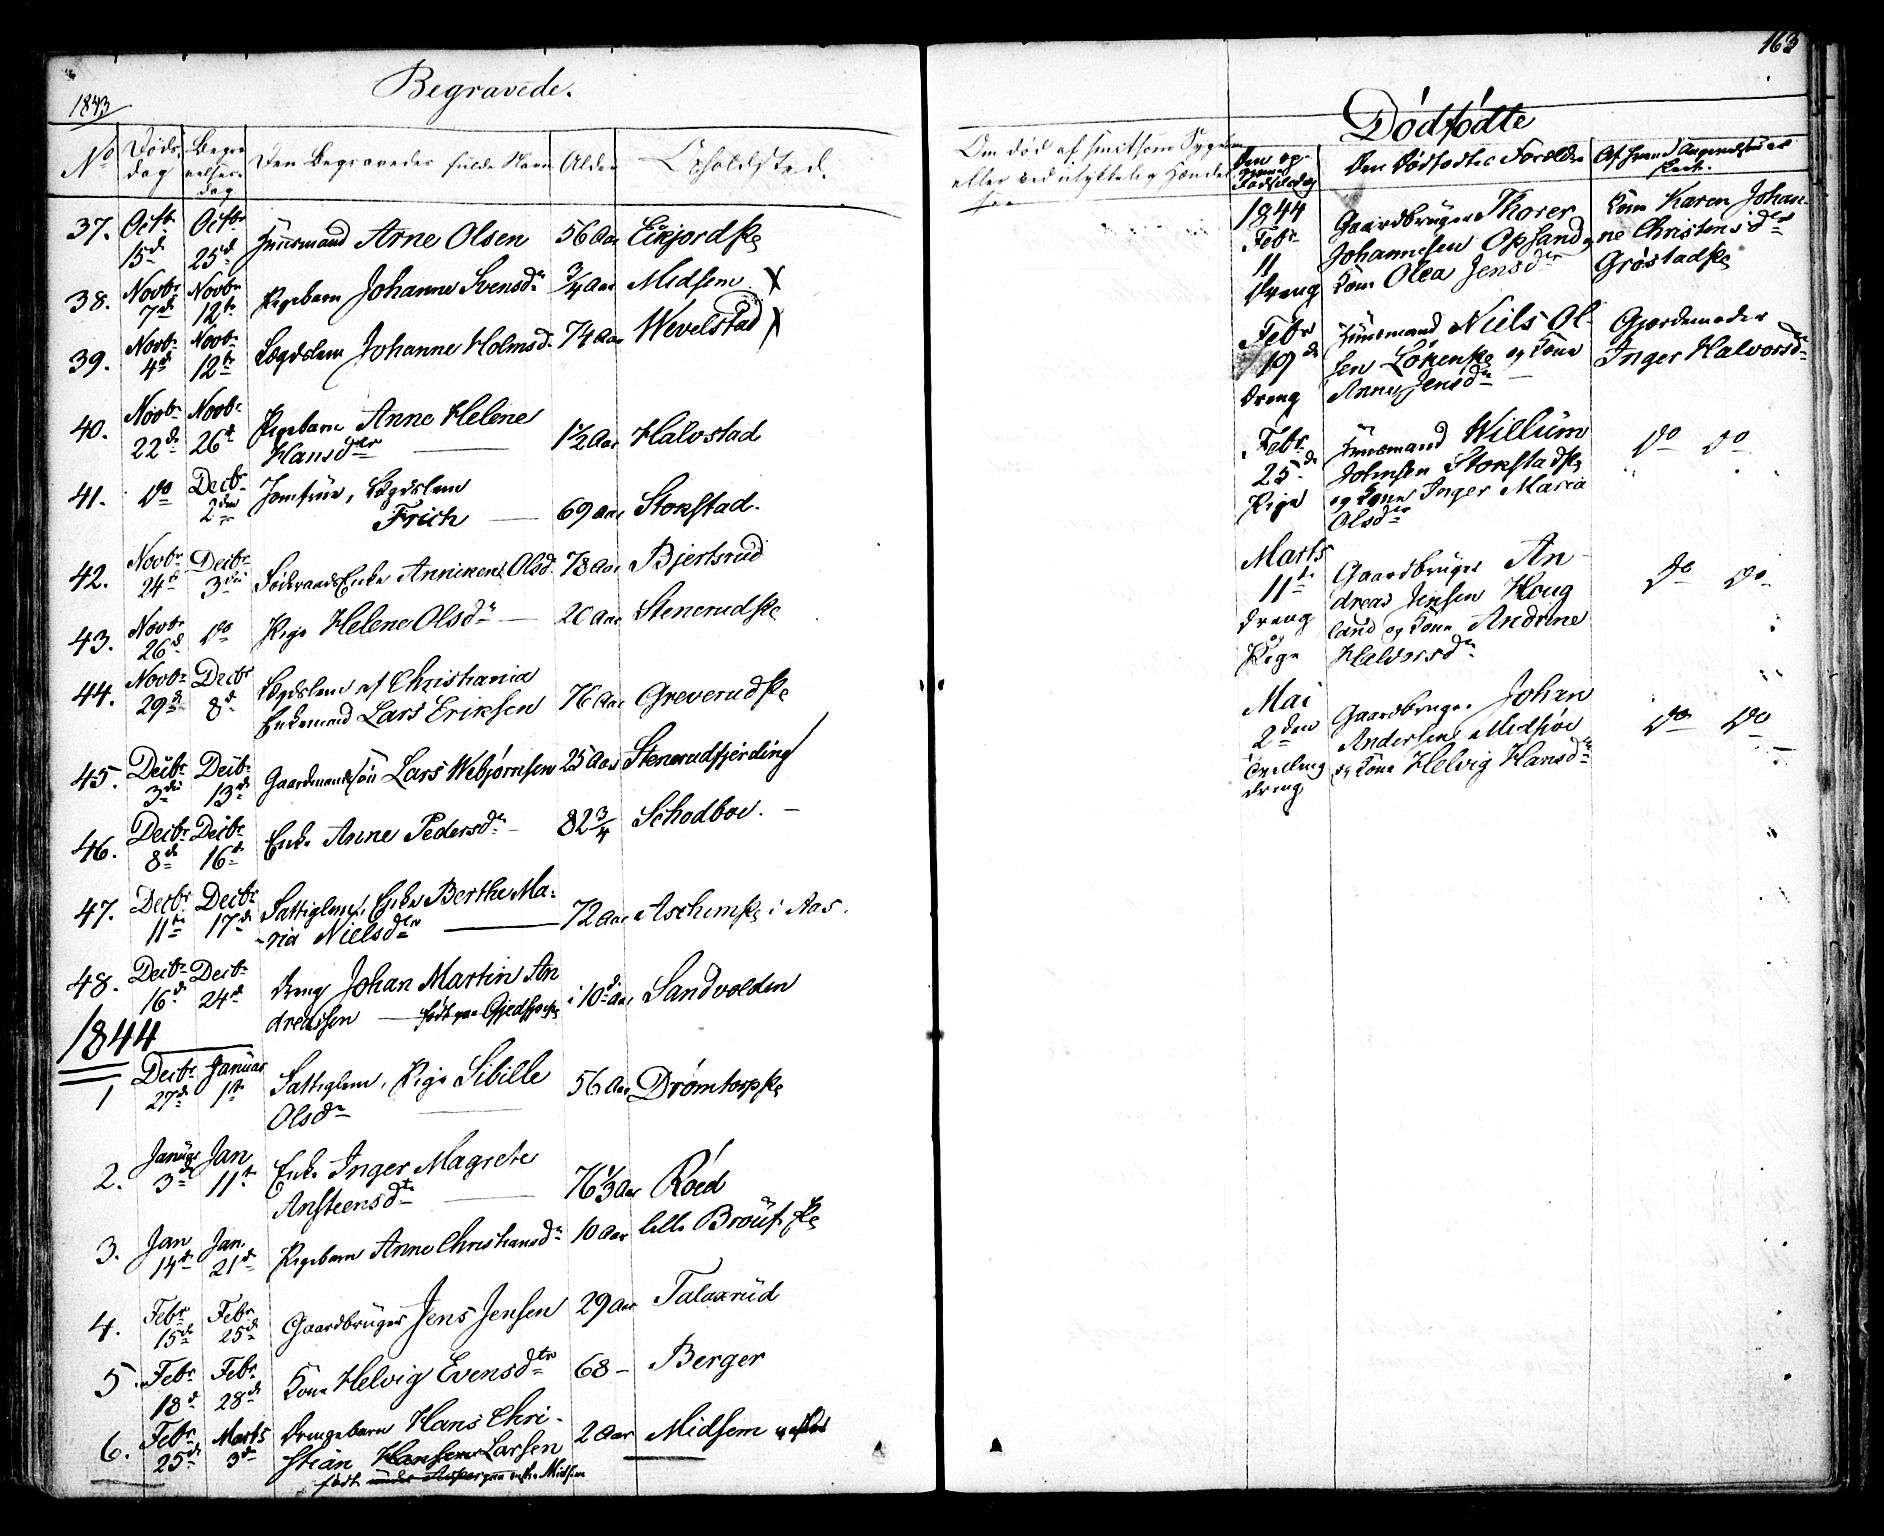 SAO, Kråkstad prestekontor Kirkebøker, F/Fa/L0005: Ministerialbok nr. I 5, 1837-1847, s. 163